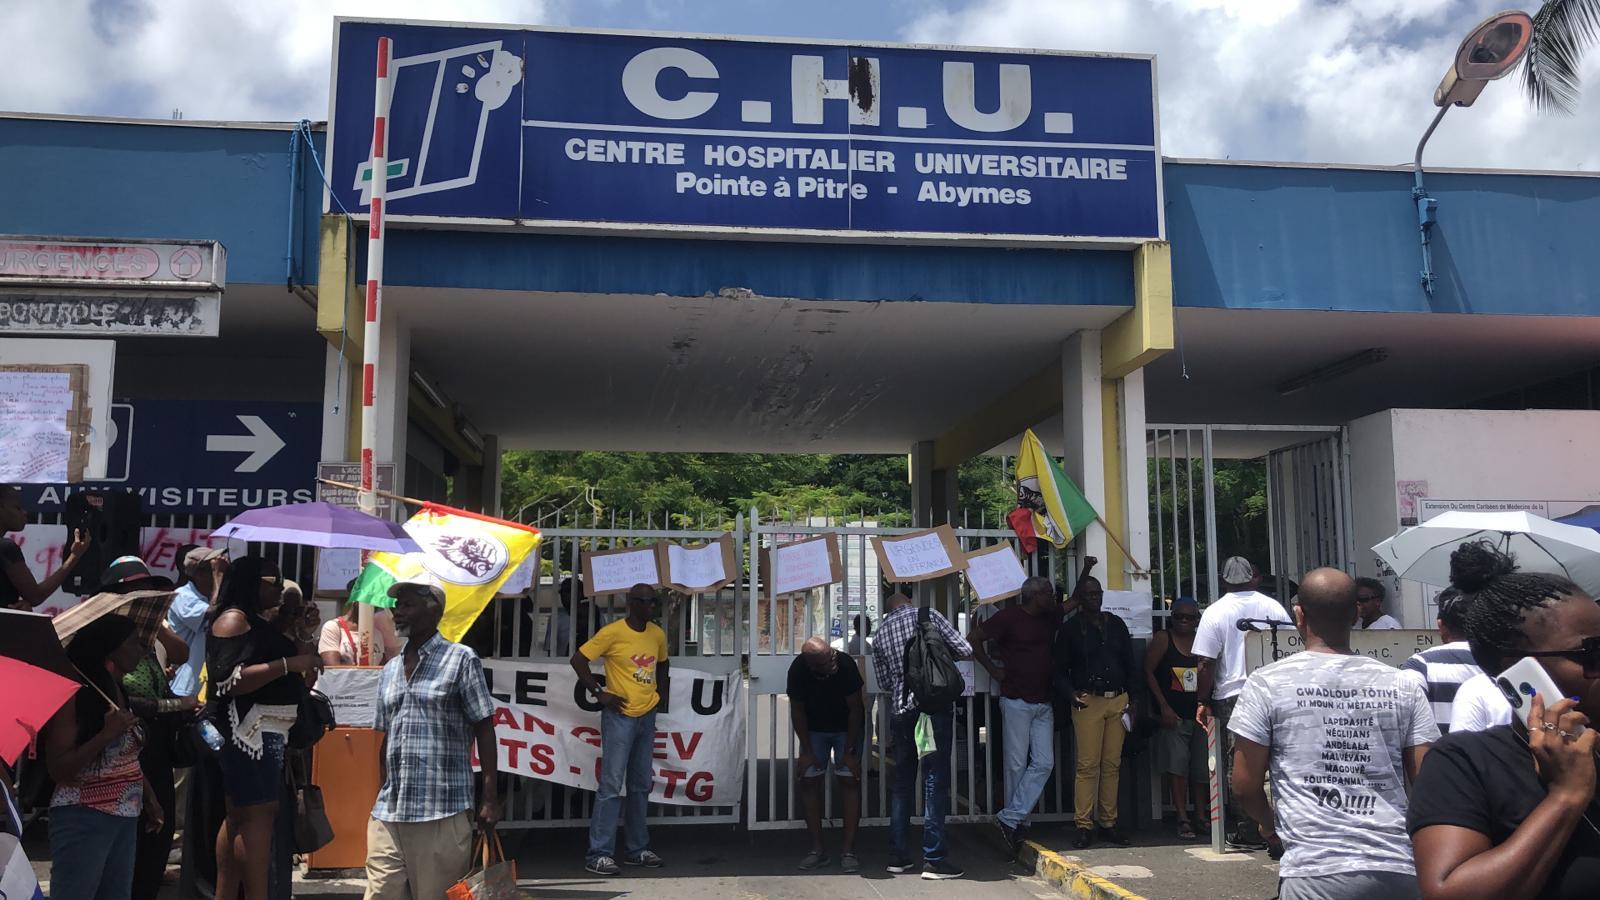 Grève générale au CHU ce mardi (vidéo)